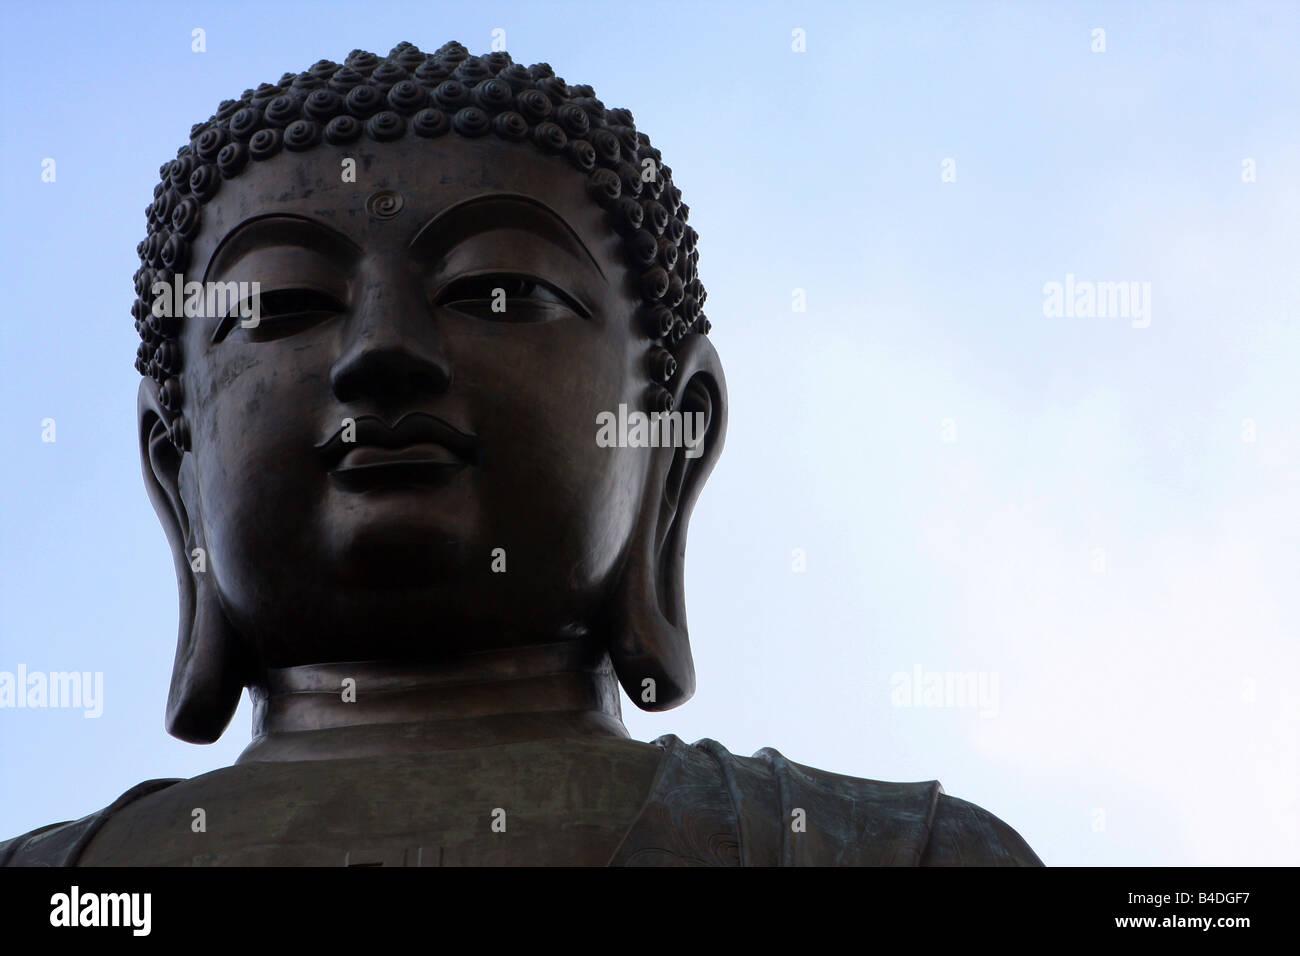 Tian Tan Buddha (Big Buddha), Ngong Ping, Lantau Island, Hong Kong Stock Photo